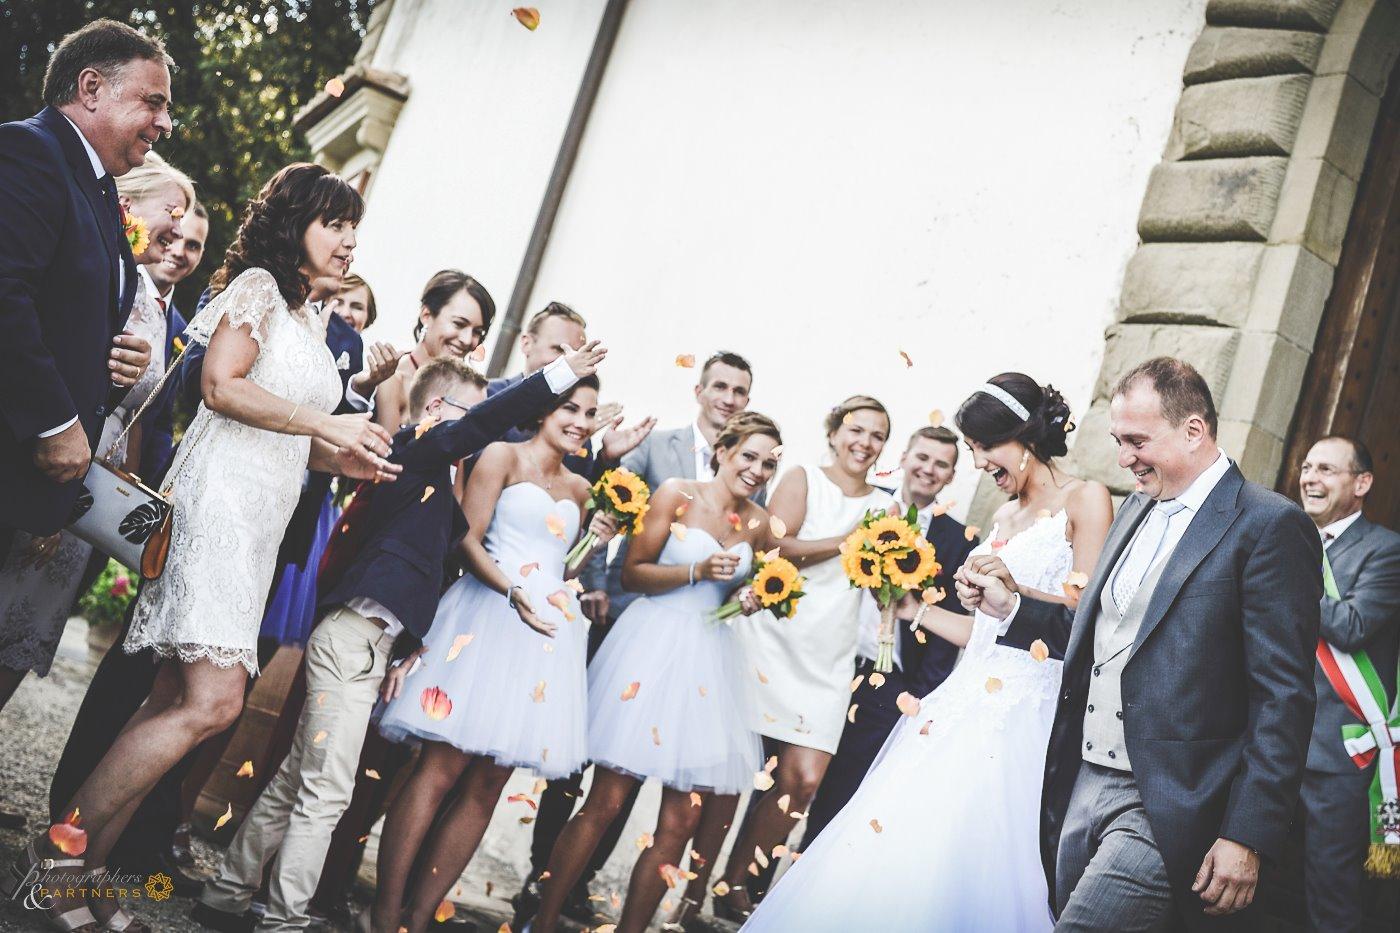 photography_weddings_vicchiomaggio_11.jpg